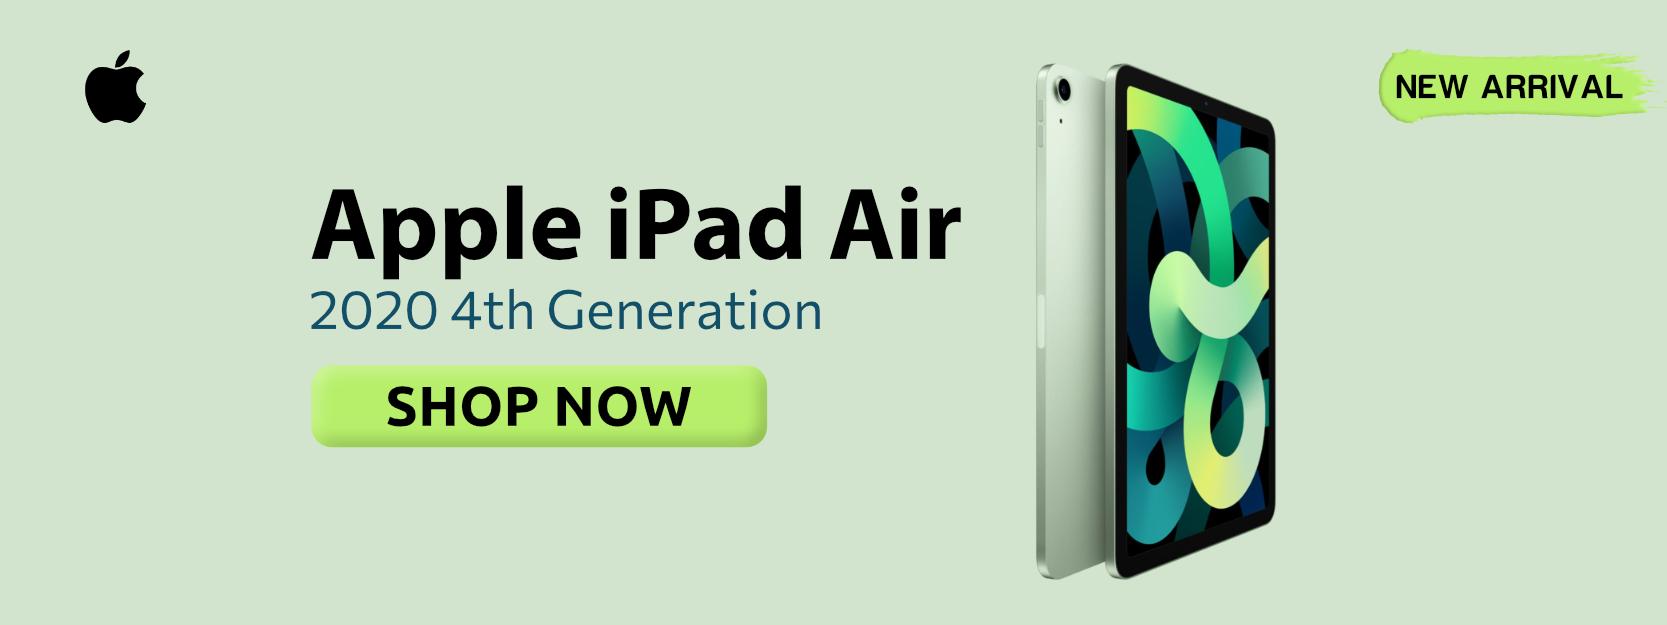 Apple ipad air 2020 in qatar